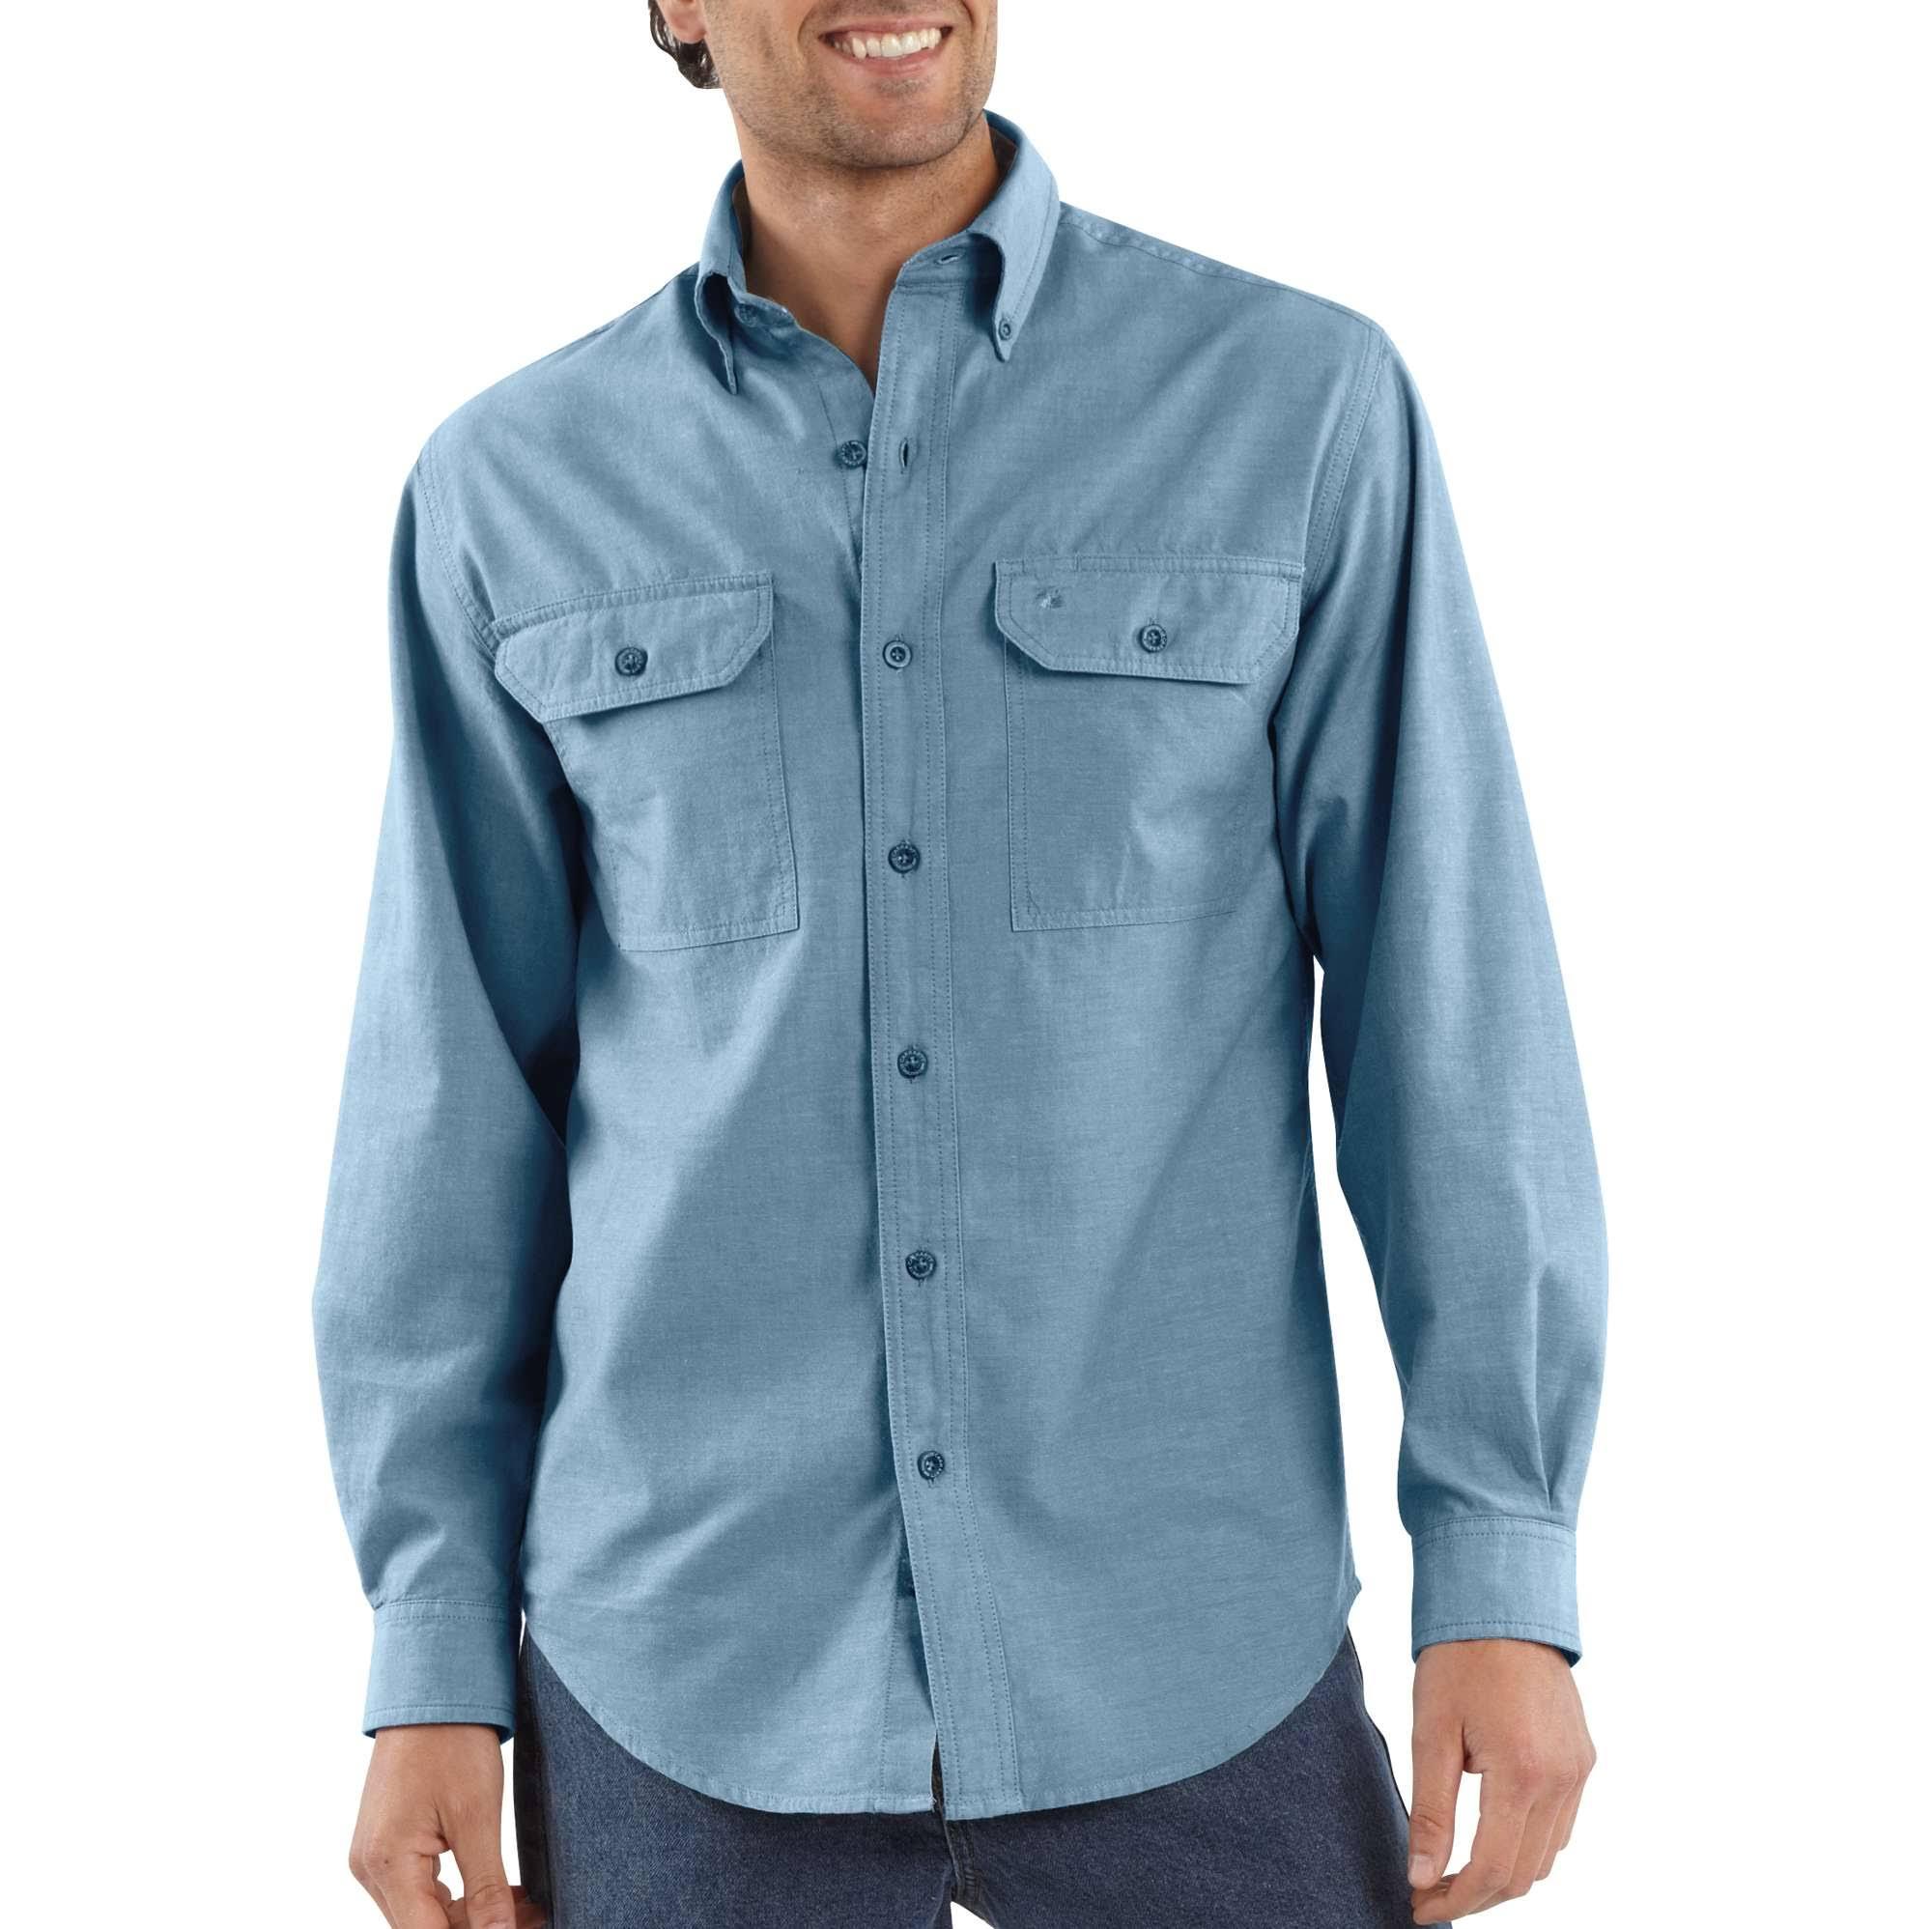 Hombre Para Carhartt De Cambray Azul Camisa Larga Manga RfcYWnyy7